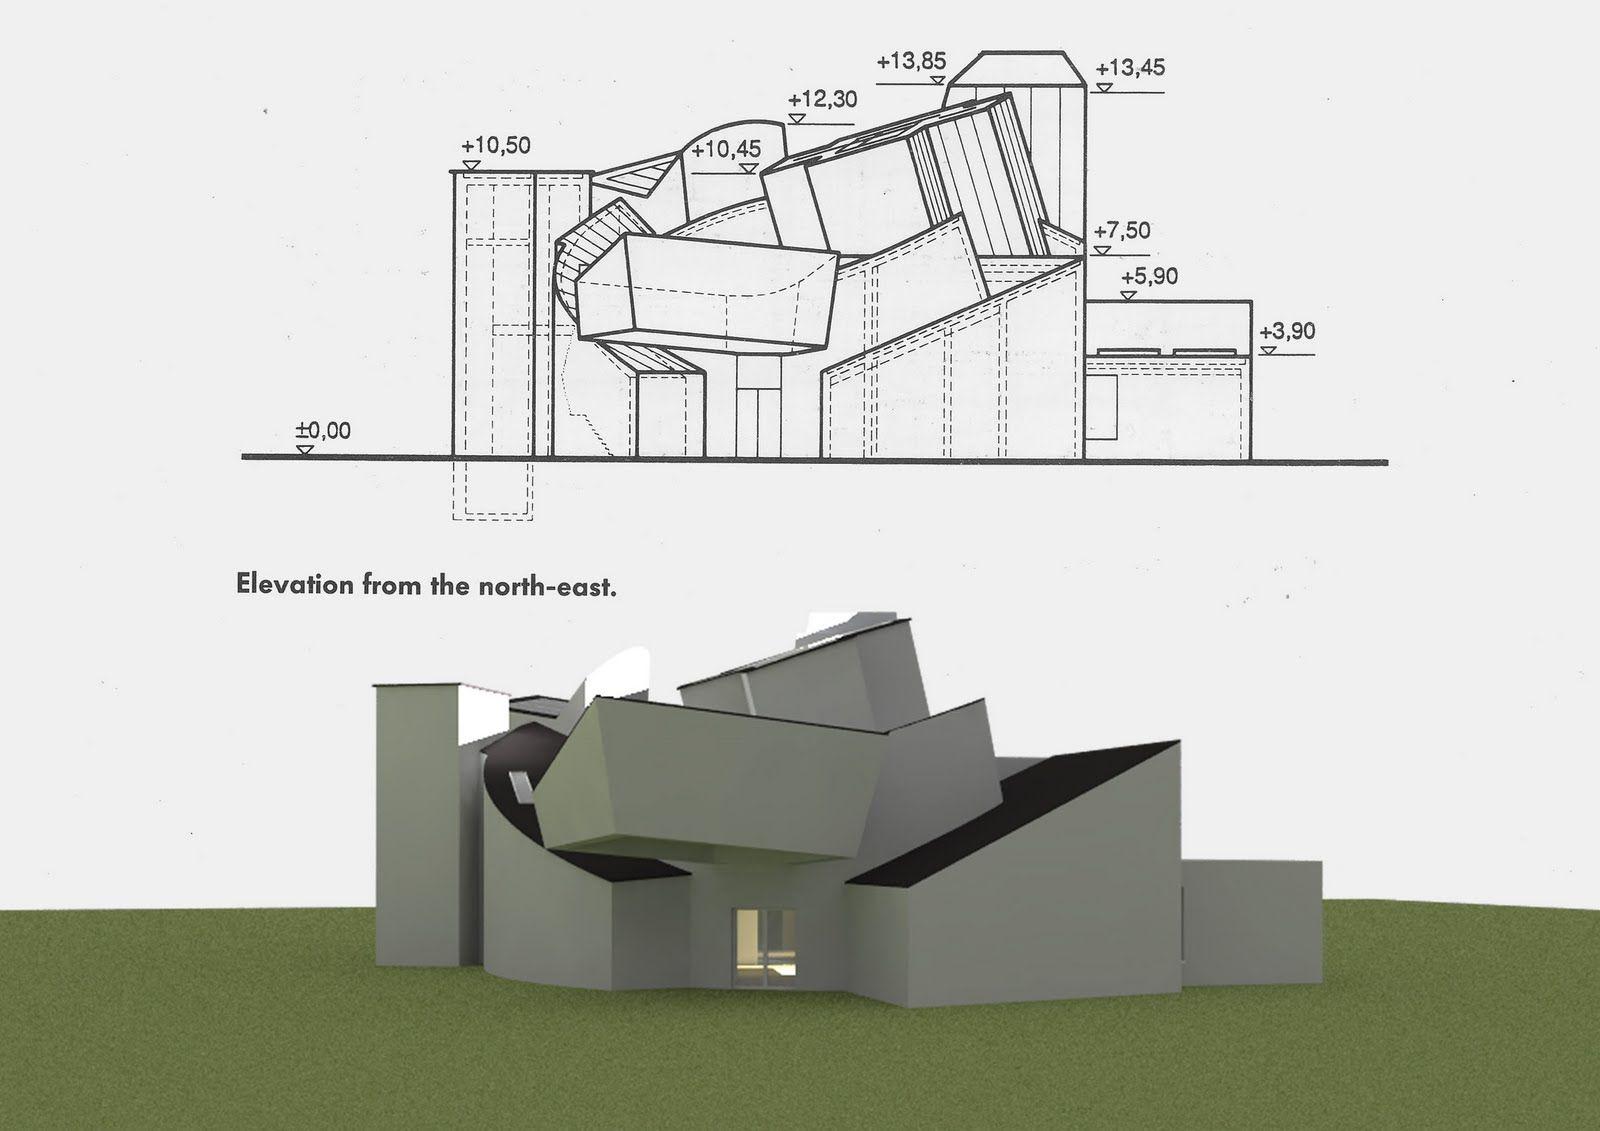 vitra design museum google search deconstructivism including peter eisemen pinterest. Black Bedroom Furniture Sets. Home Design Ideas